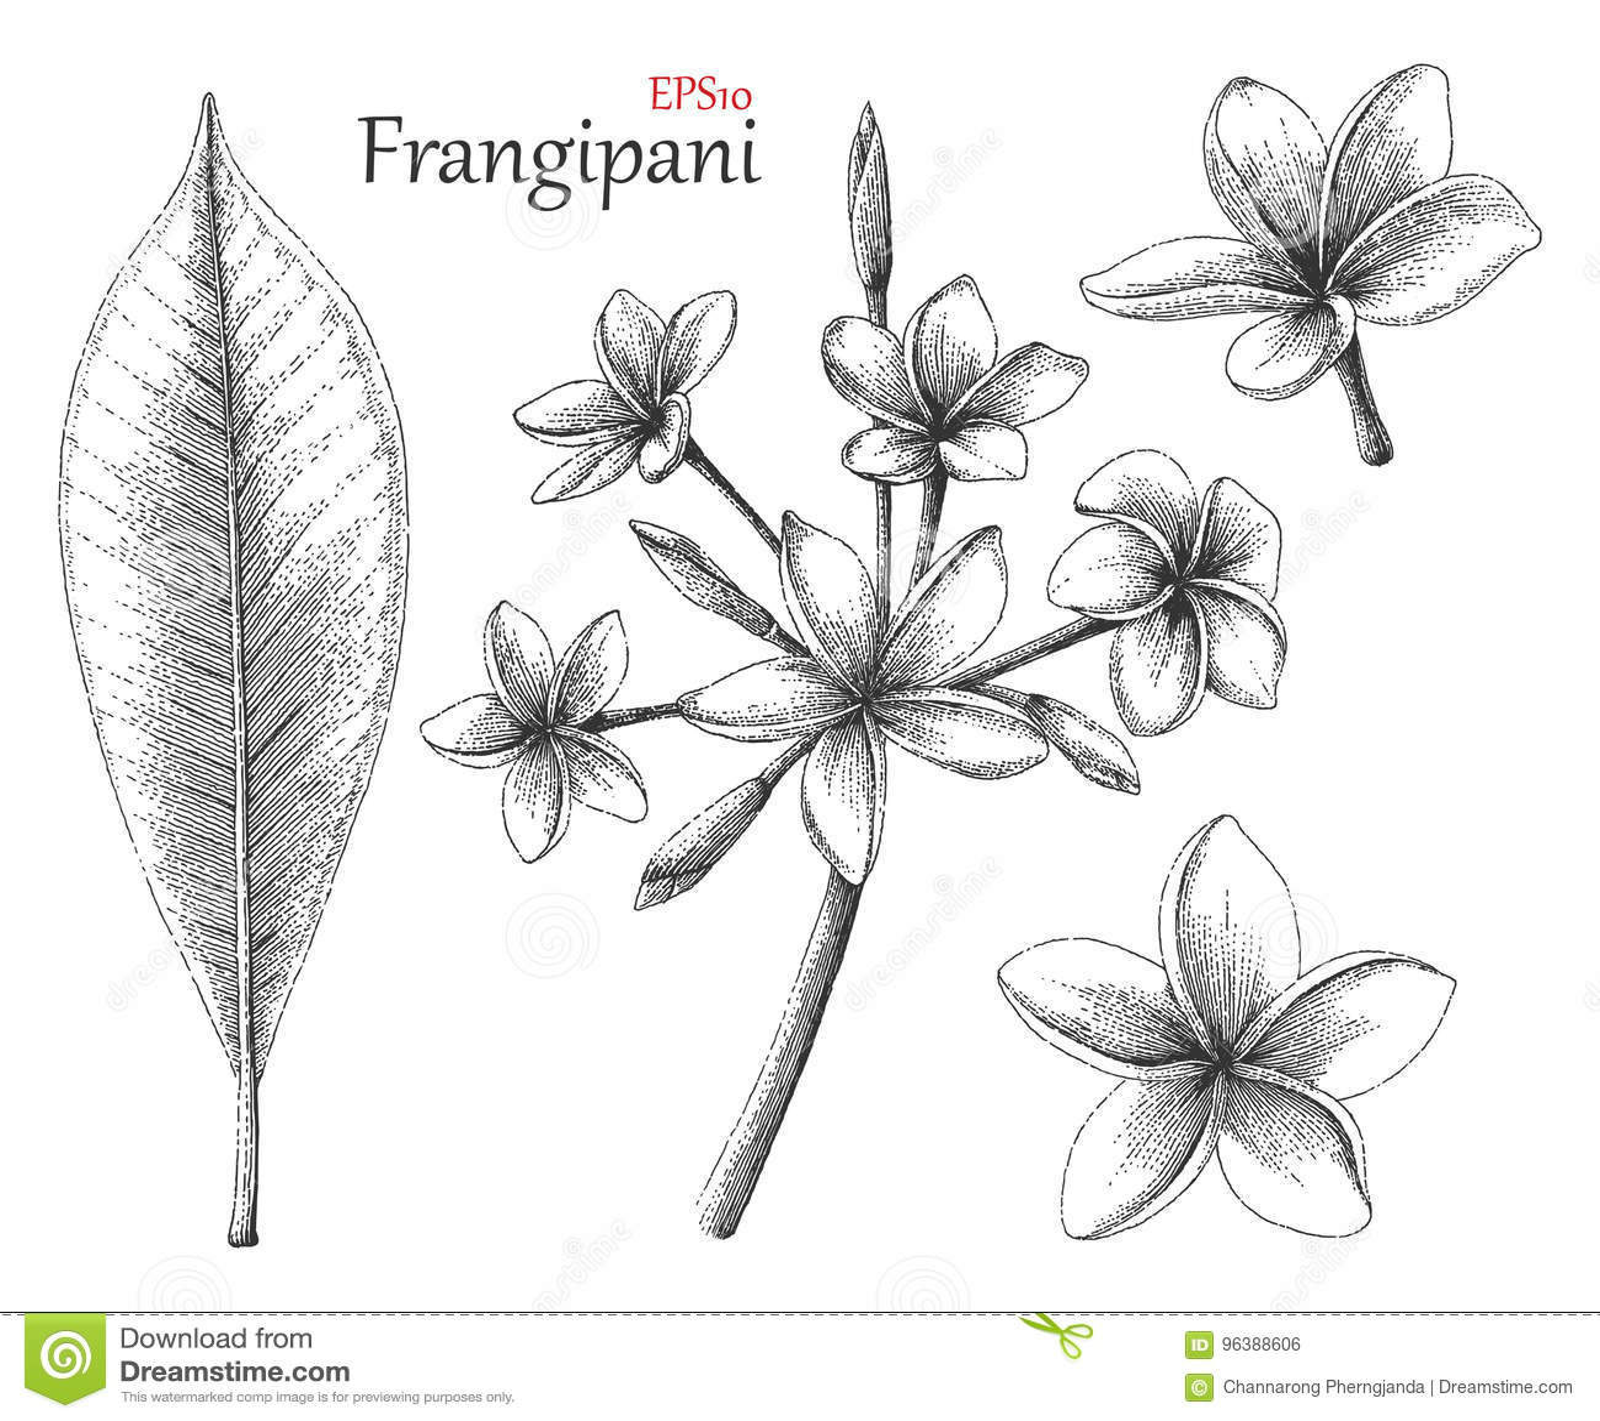 Frangipani hand drawing vintage style